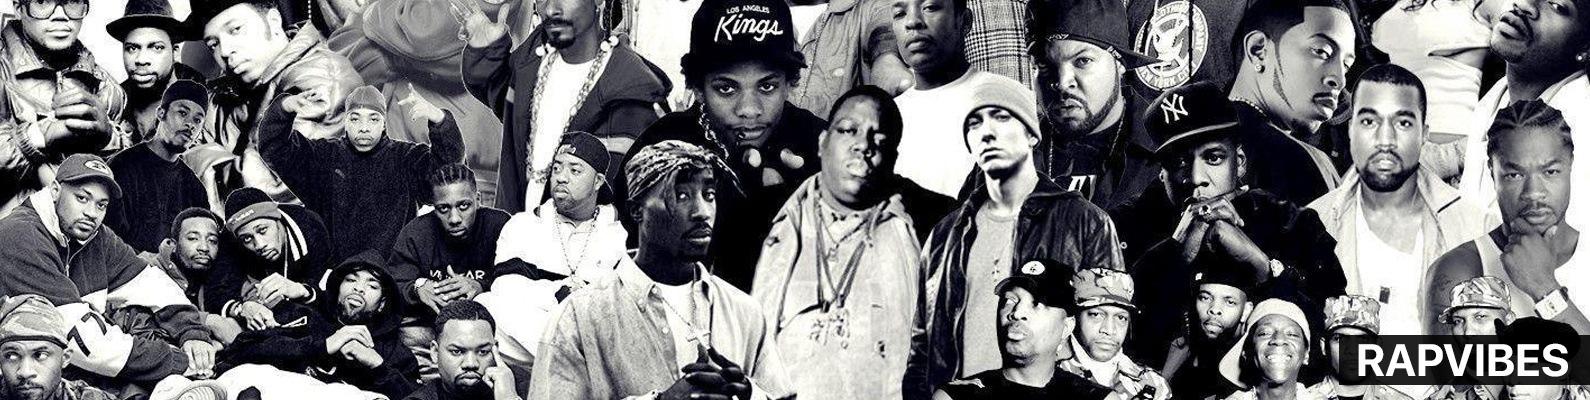 Rap Vibes   ВКонтакте c6482a26aaa